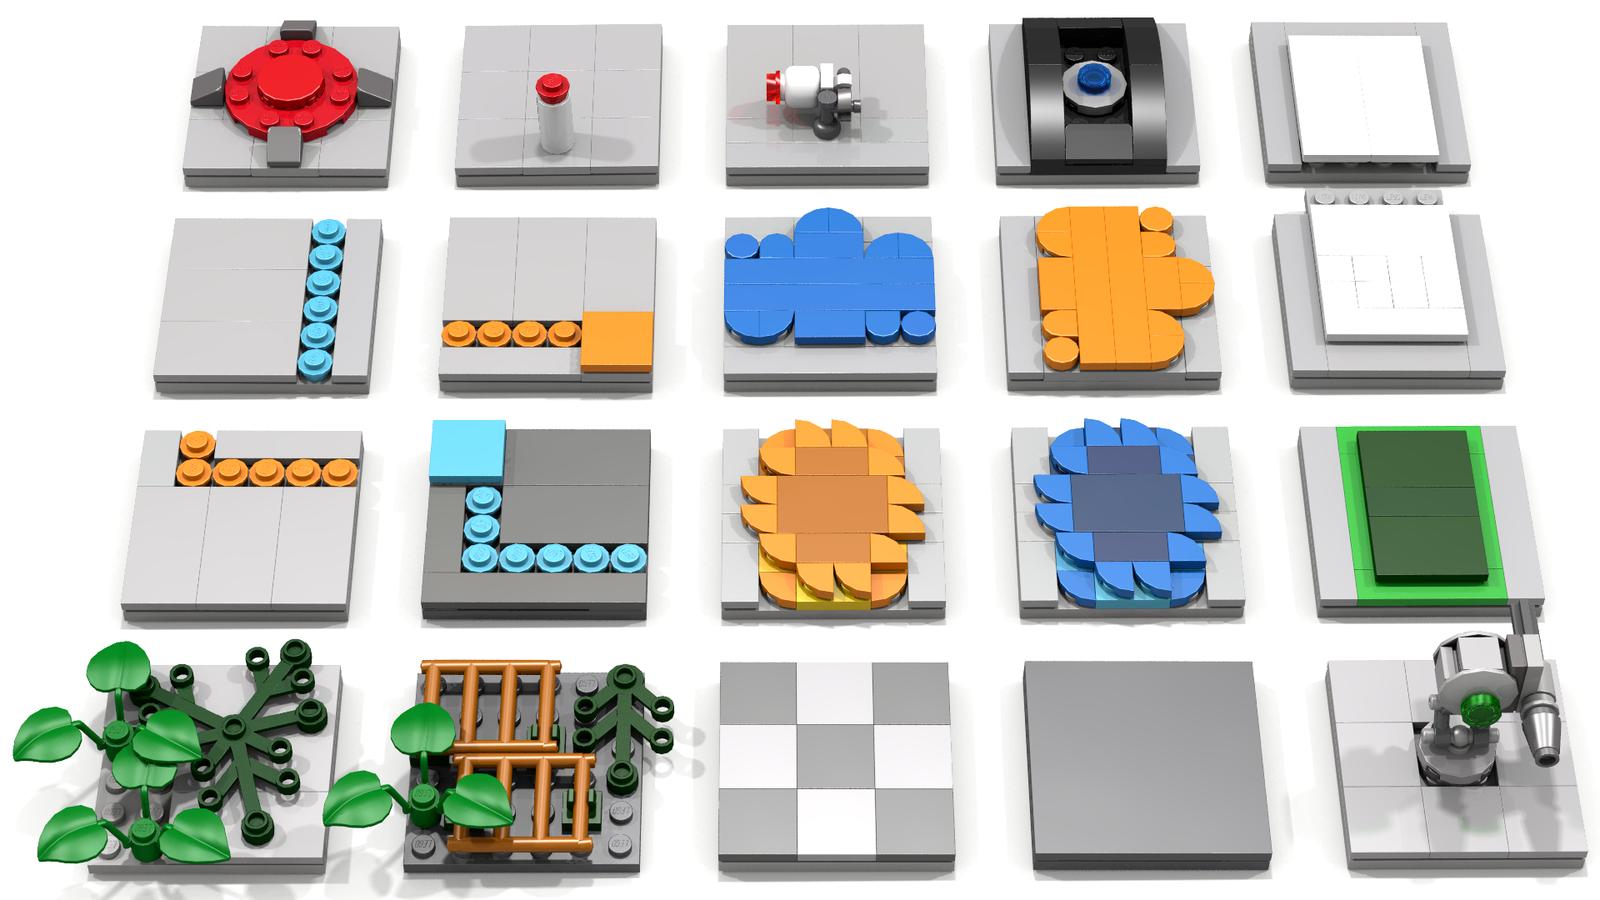 LEGO Ideas Modular Portal Testing Chamber